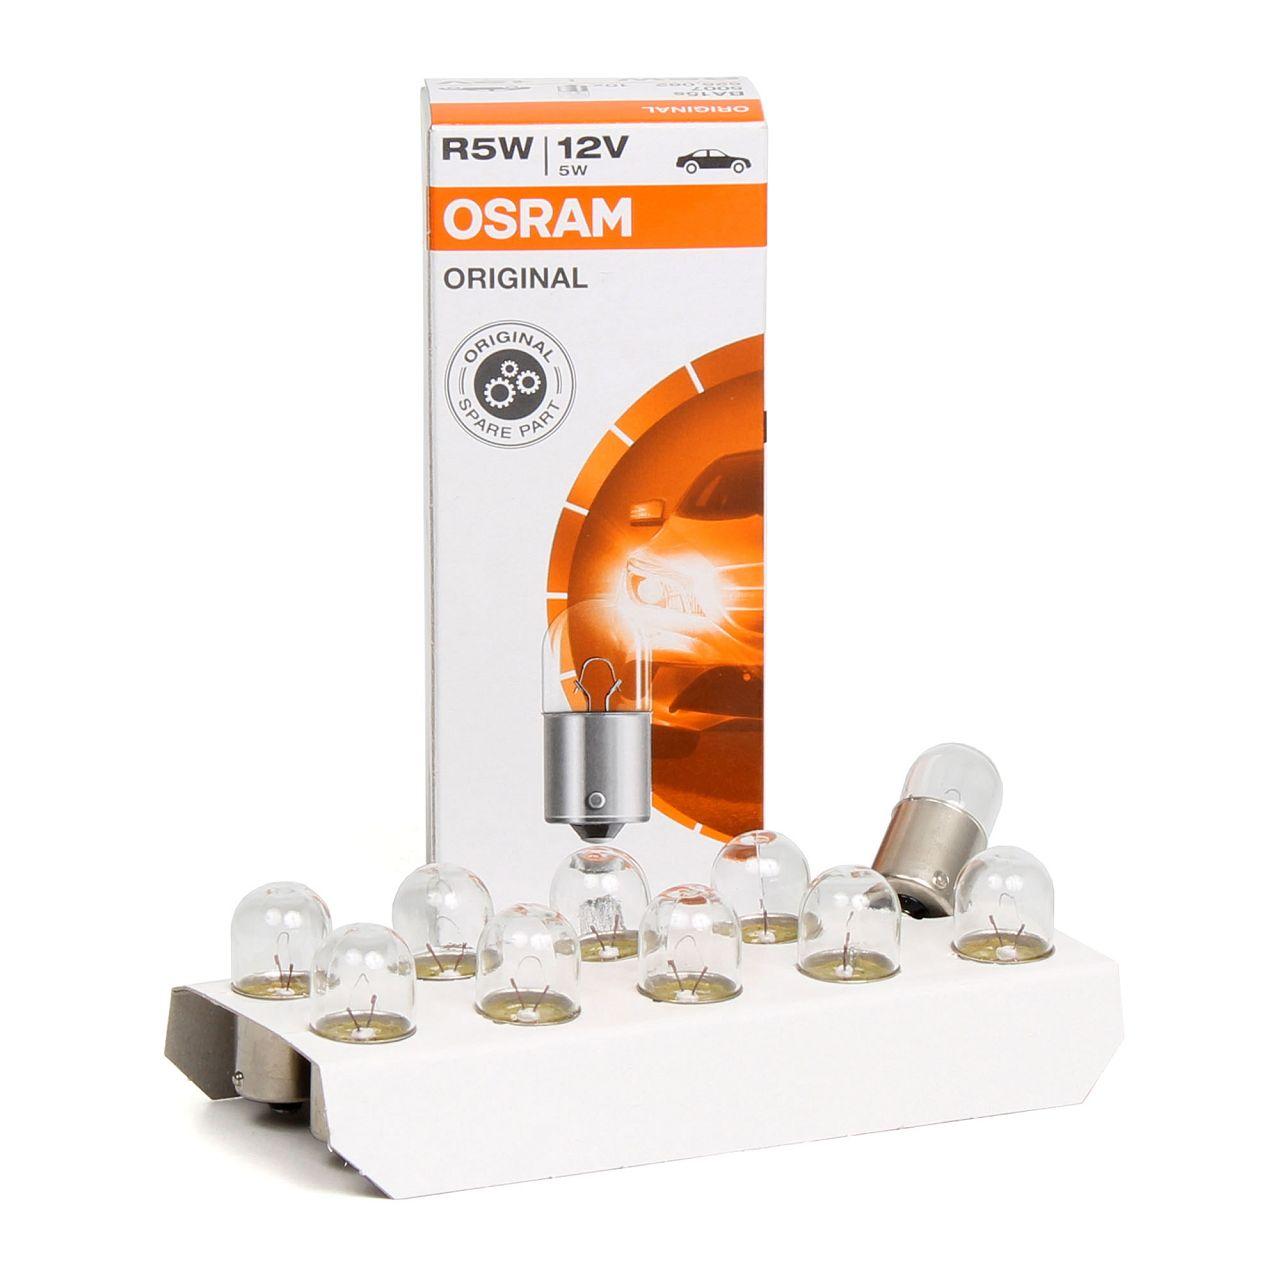 10x OSRAM 5007 Glühlampe Sockelglühlampe R5W ORIGINAL-Line 12V 5W BA15s